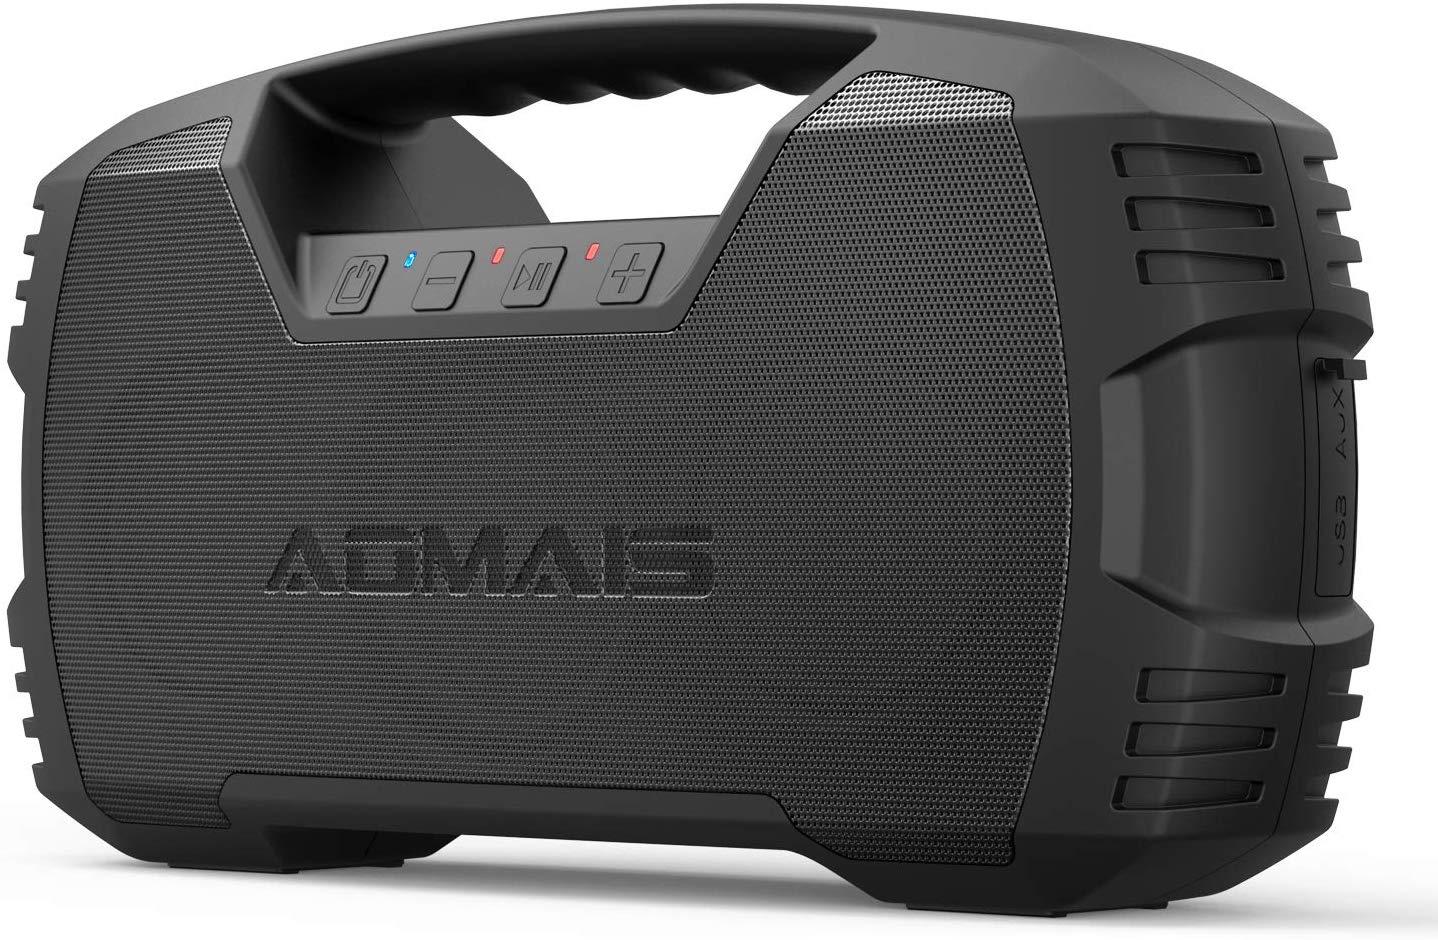 buying best Bluetooth speaker under 100 in 2019/20 - AOMAIS GO